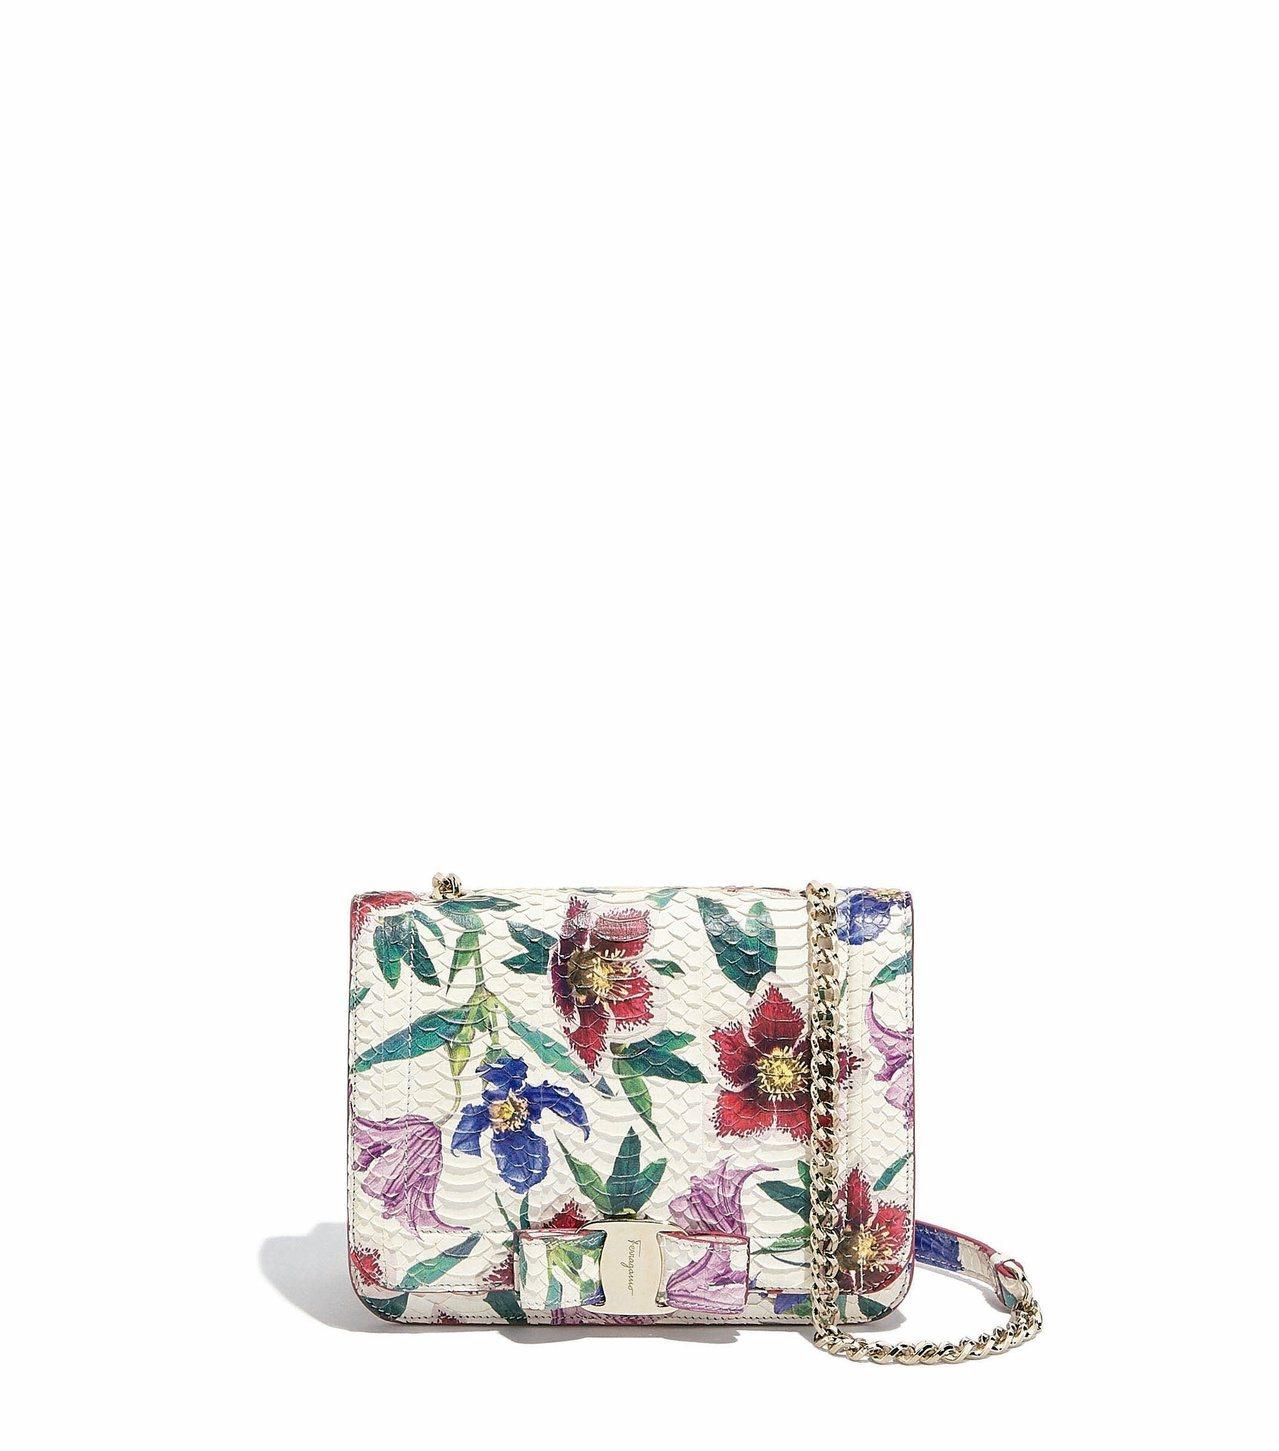 Vara Rainbow白色花卉圖案蛇皮鍊帶包,71,900元。圖/Ferrag...